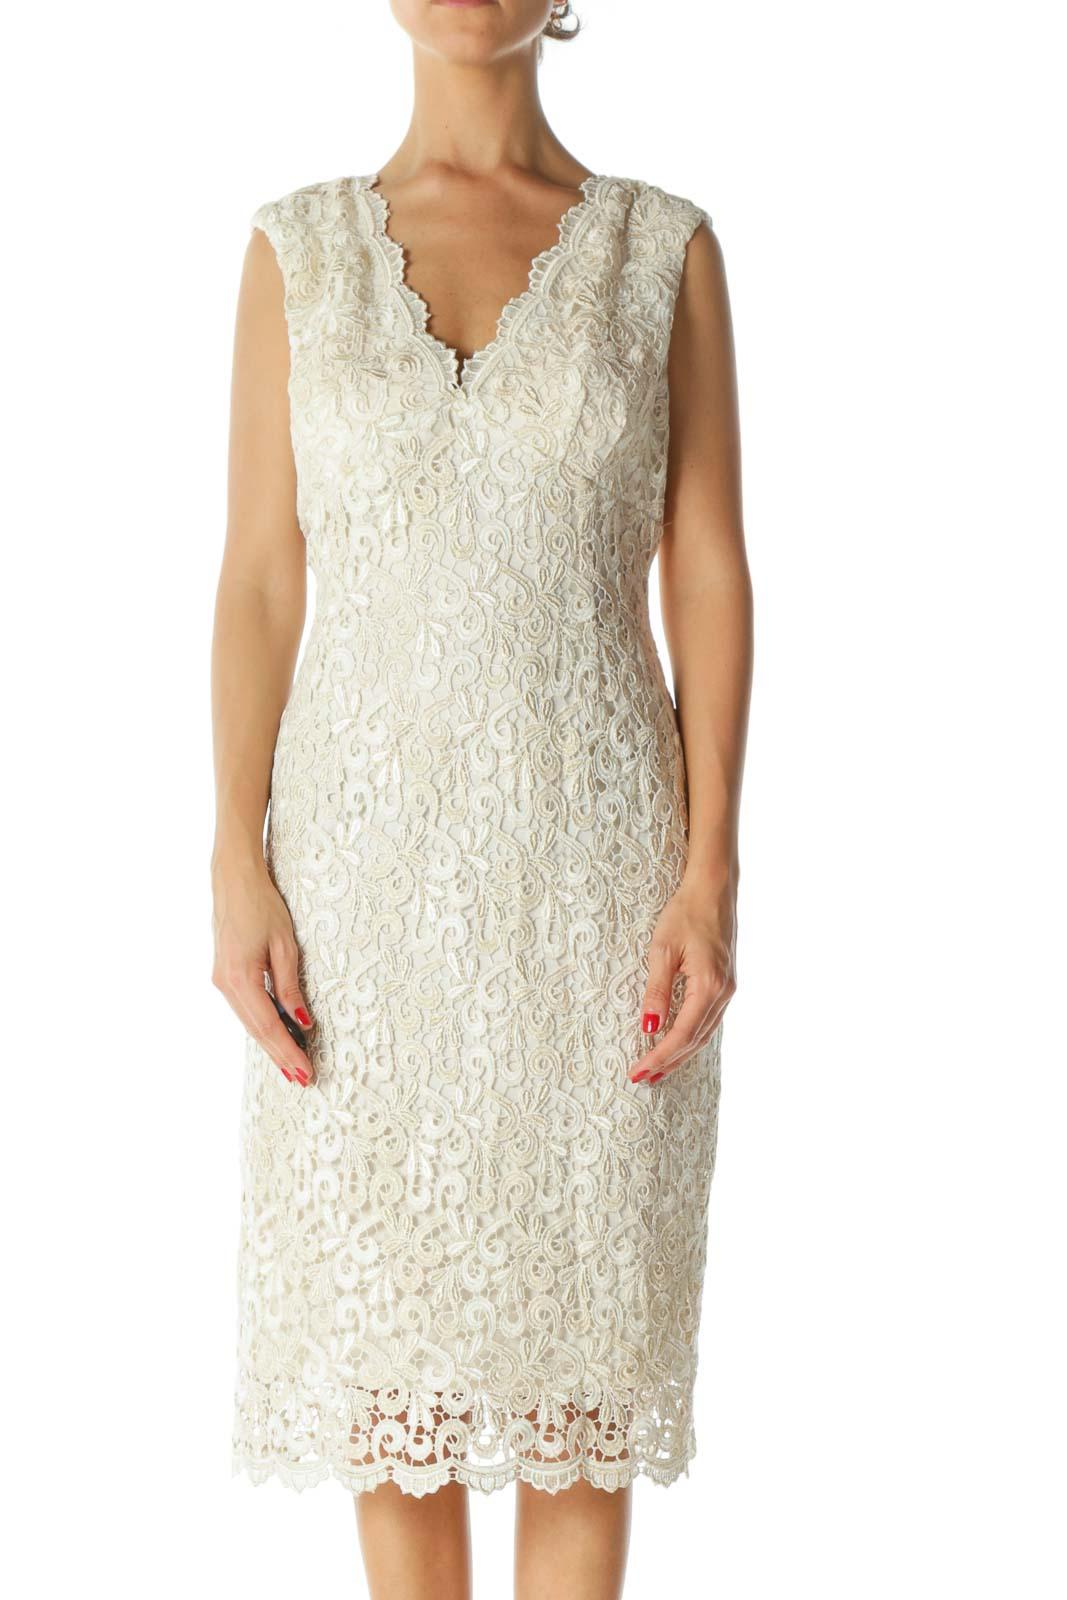 Cream Embroidered Metallic Dress Front